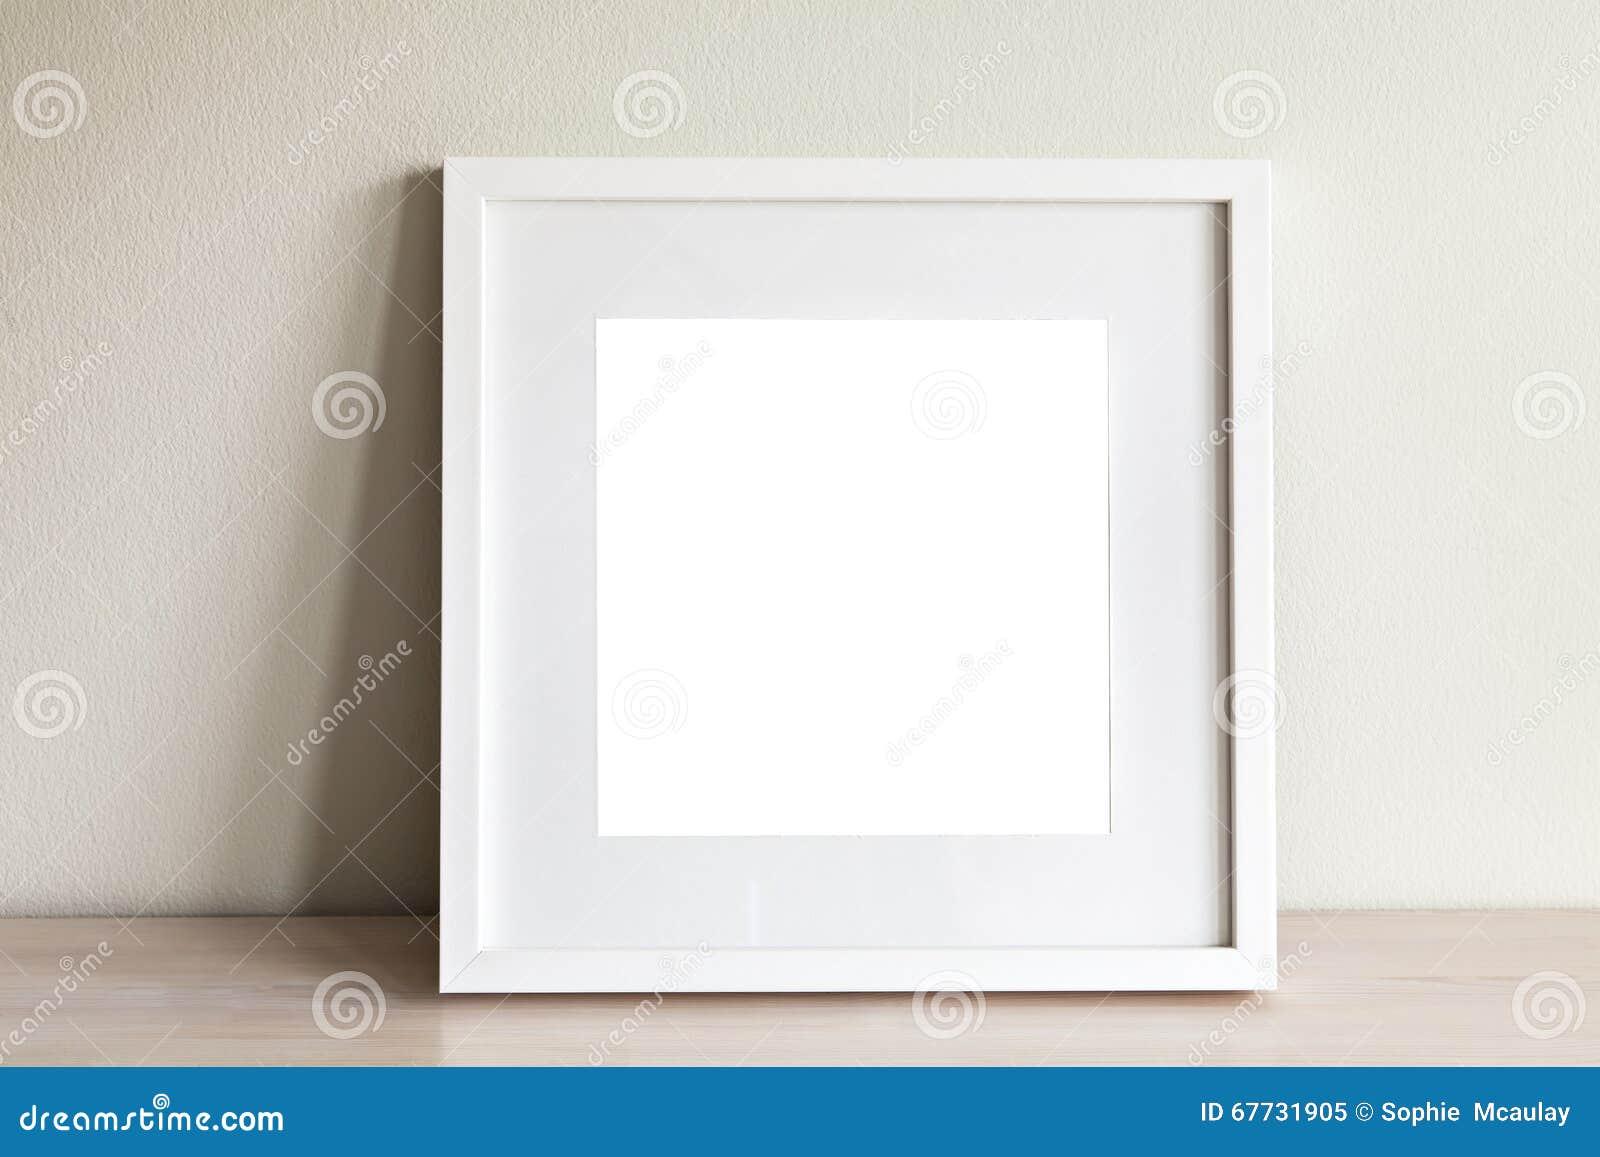 White square frame mockup stock image. Image of empty - 67731905